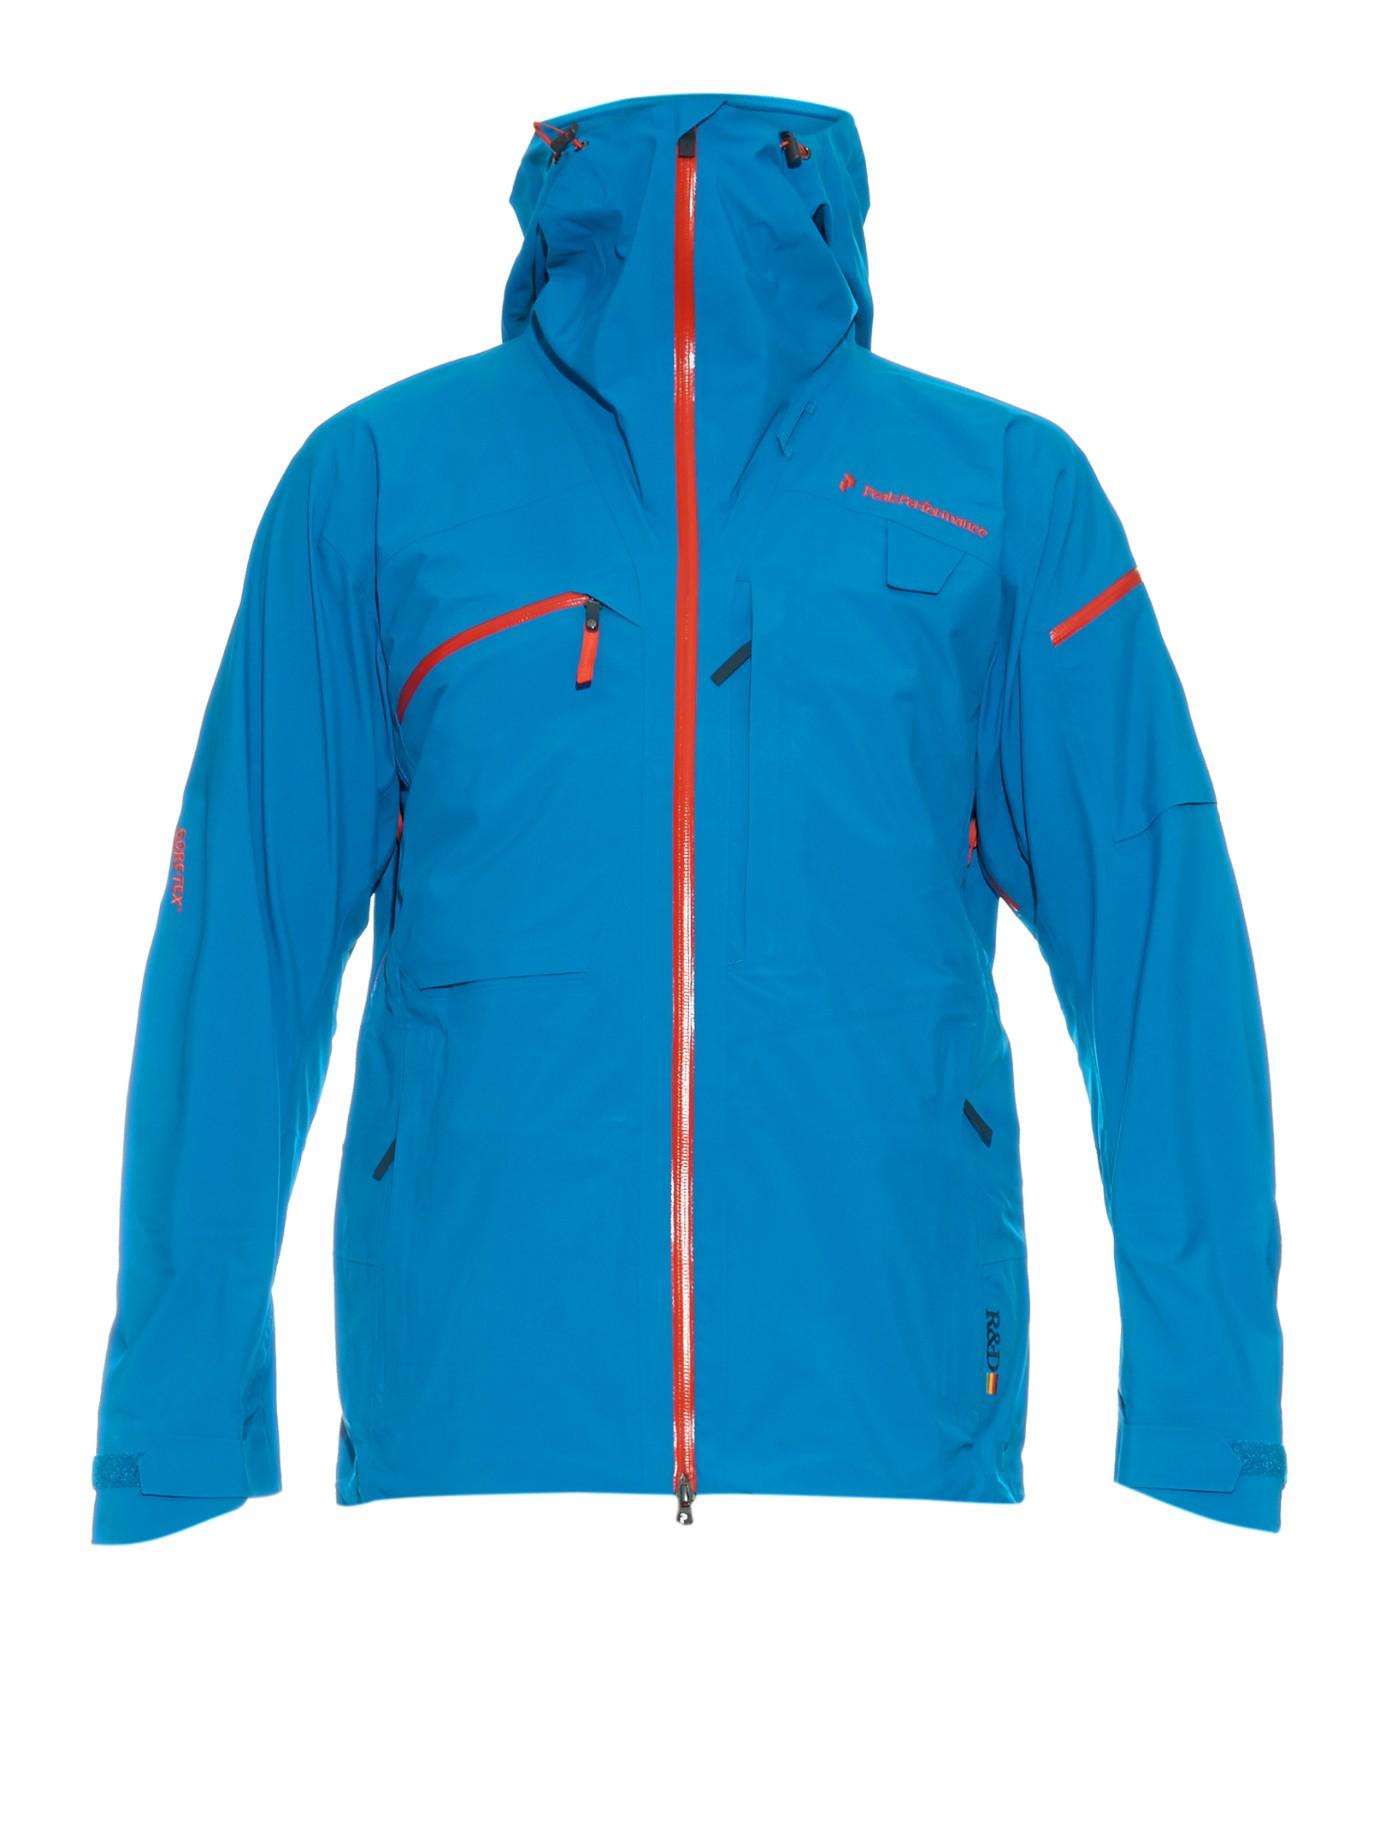 peak performance heli alpine technical ski jacket in blue